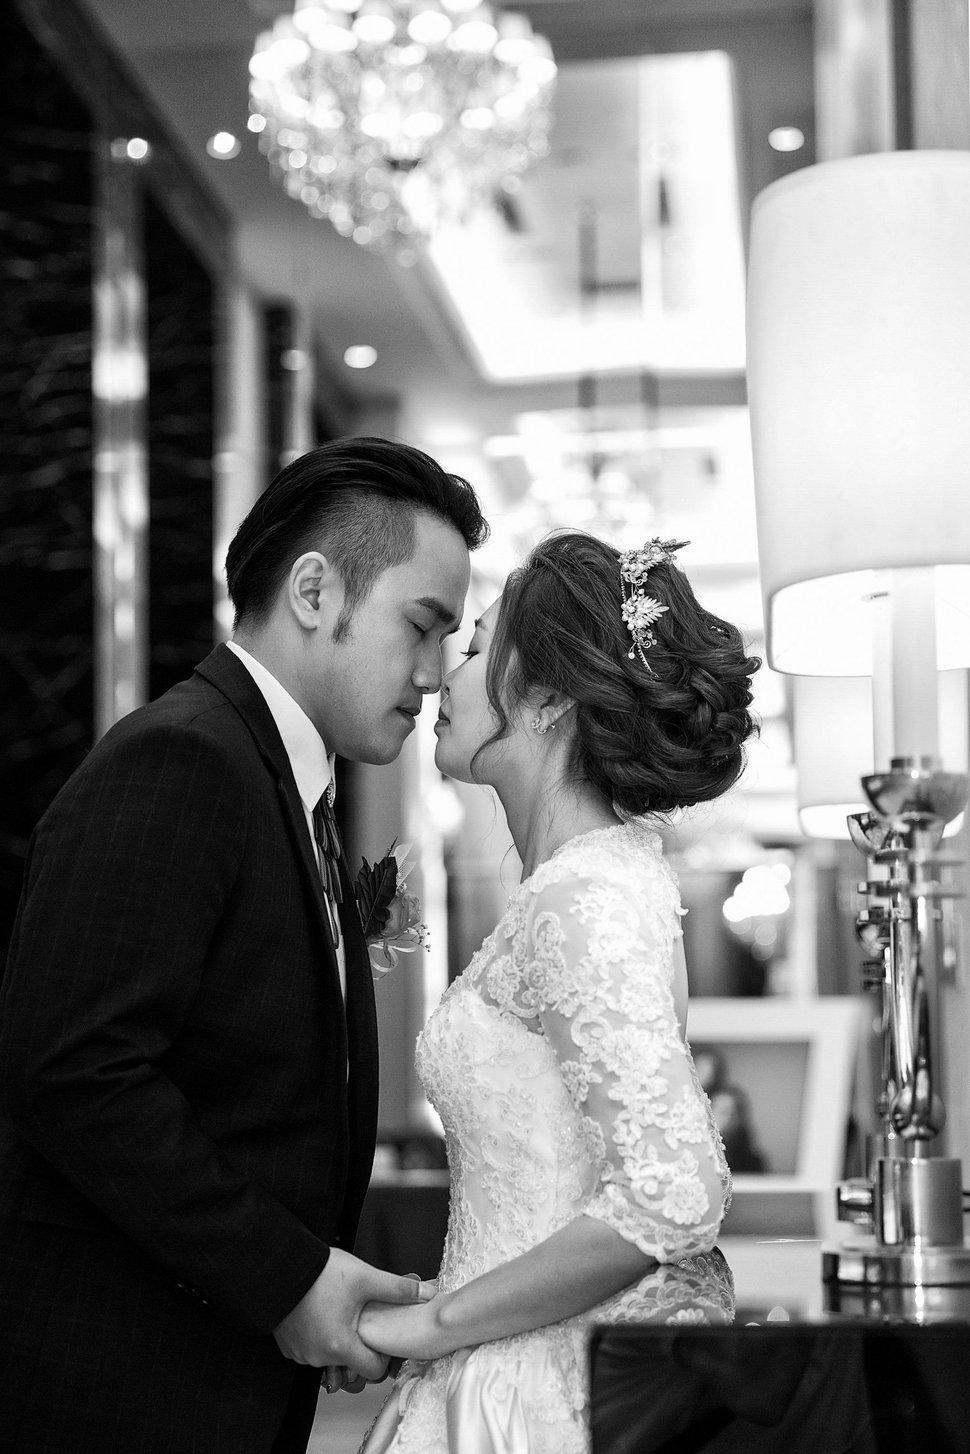 0419-214 - My Darling 寵愛妳的婚紗《結婚吧》